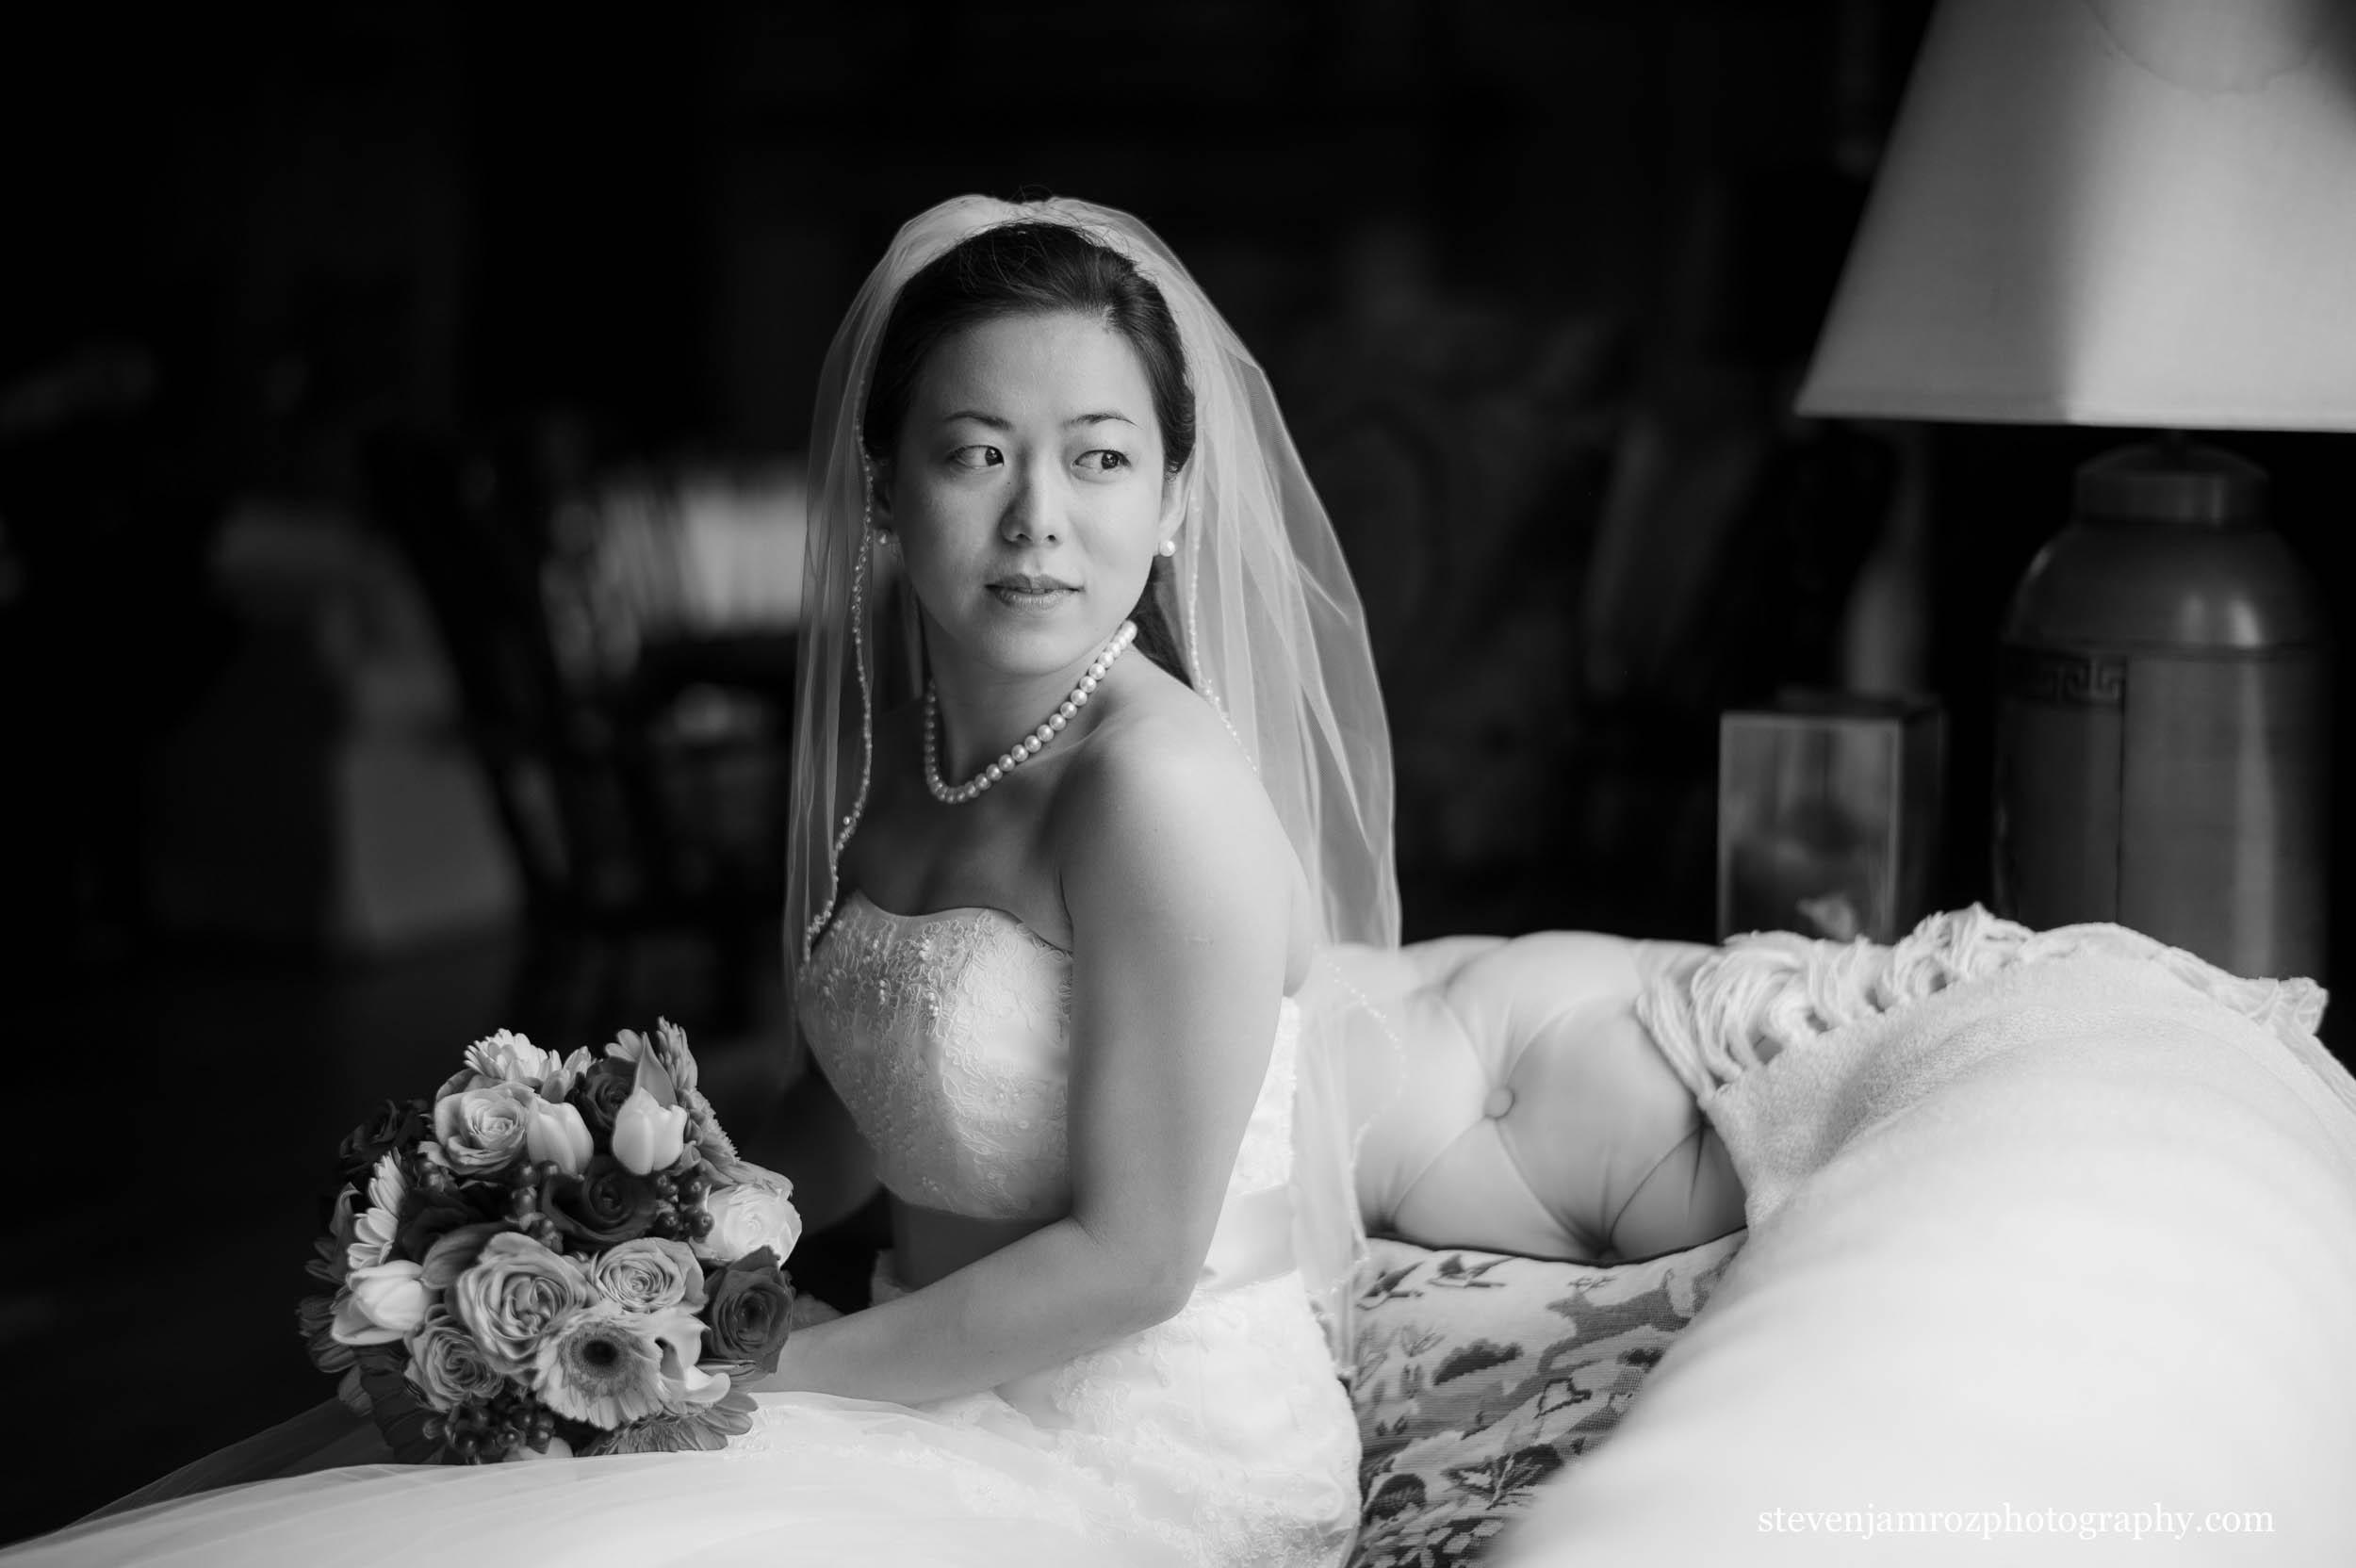 couch-portrait-rose-hill-plantation-wedding-steven-jamroz-0754.jpg